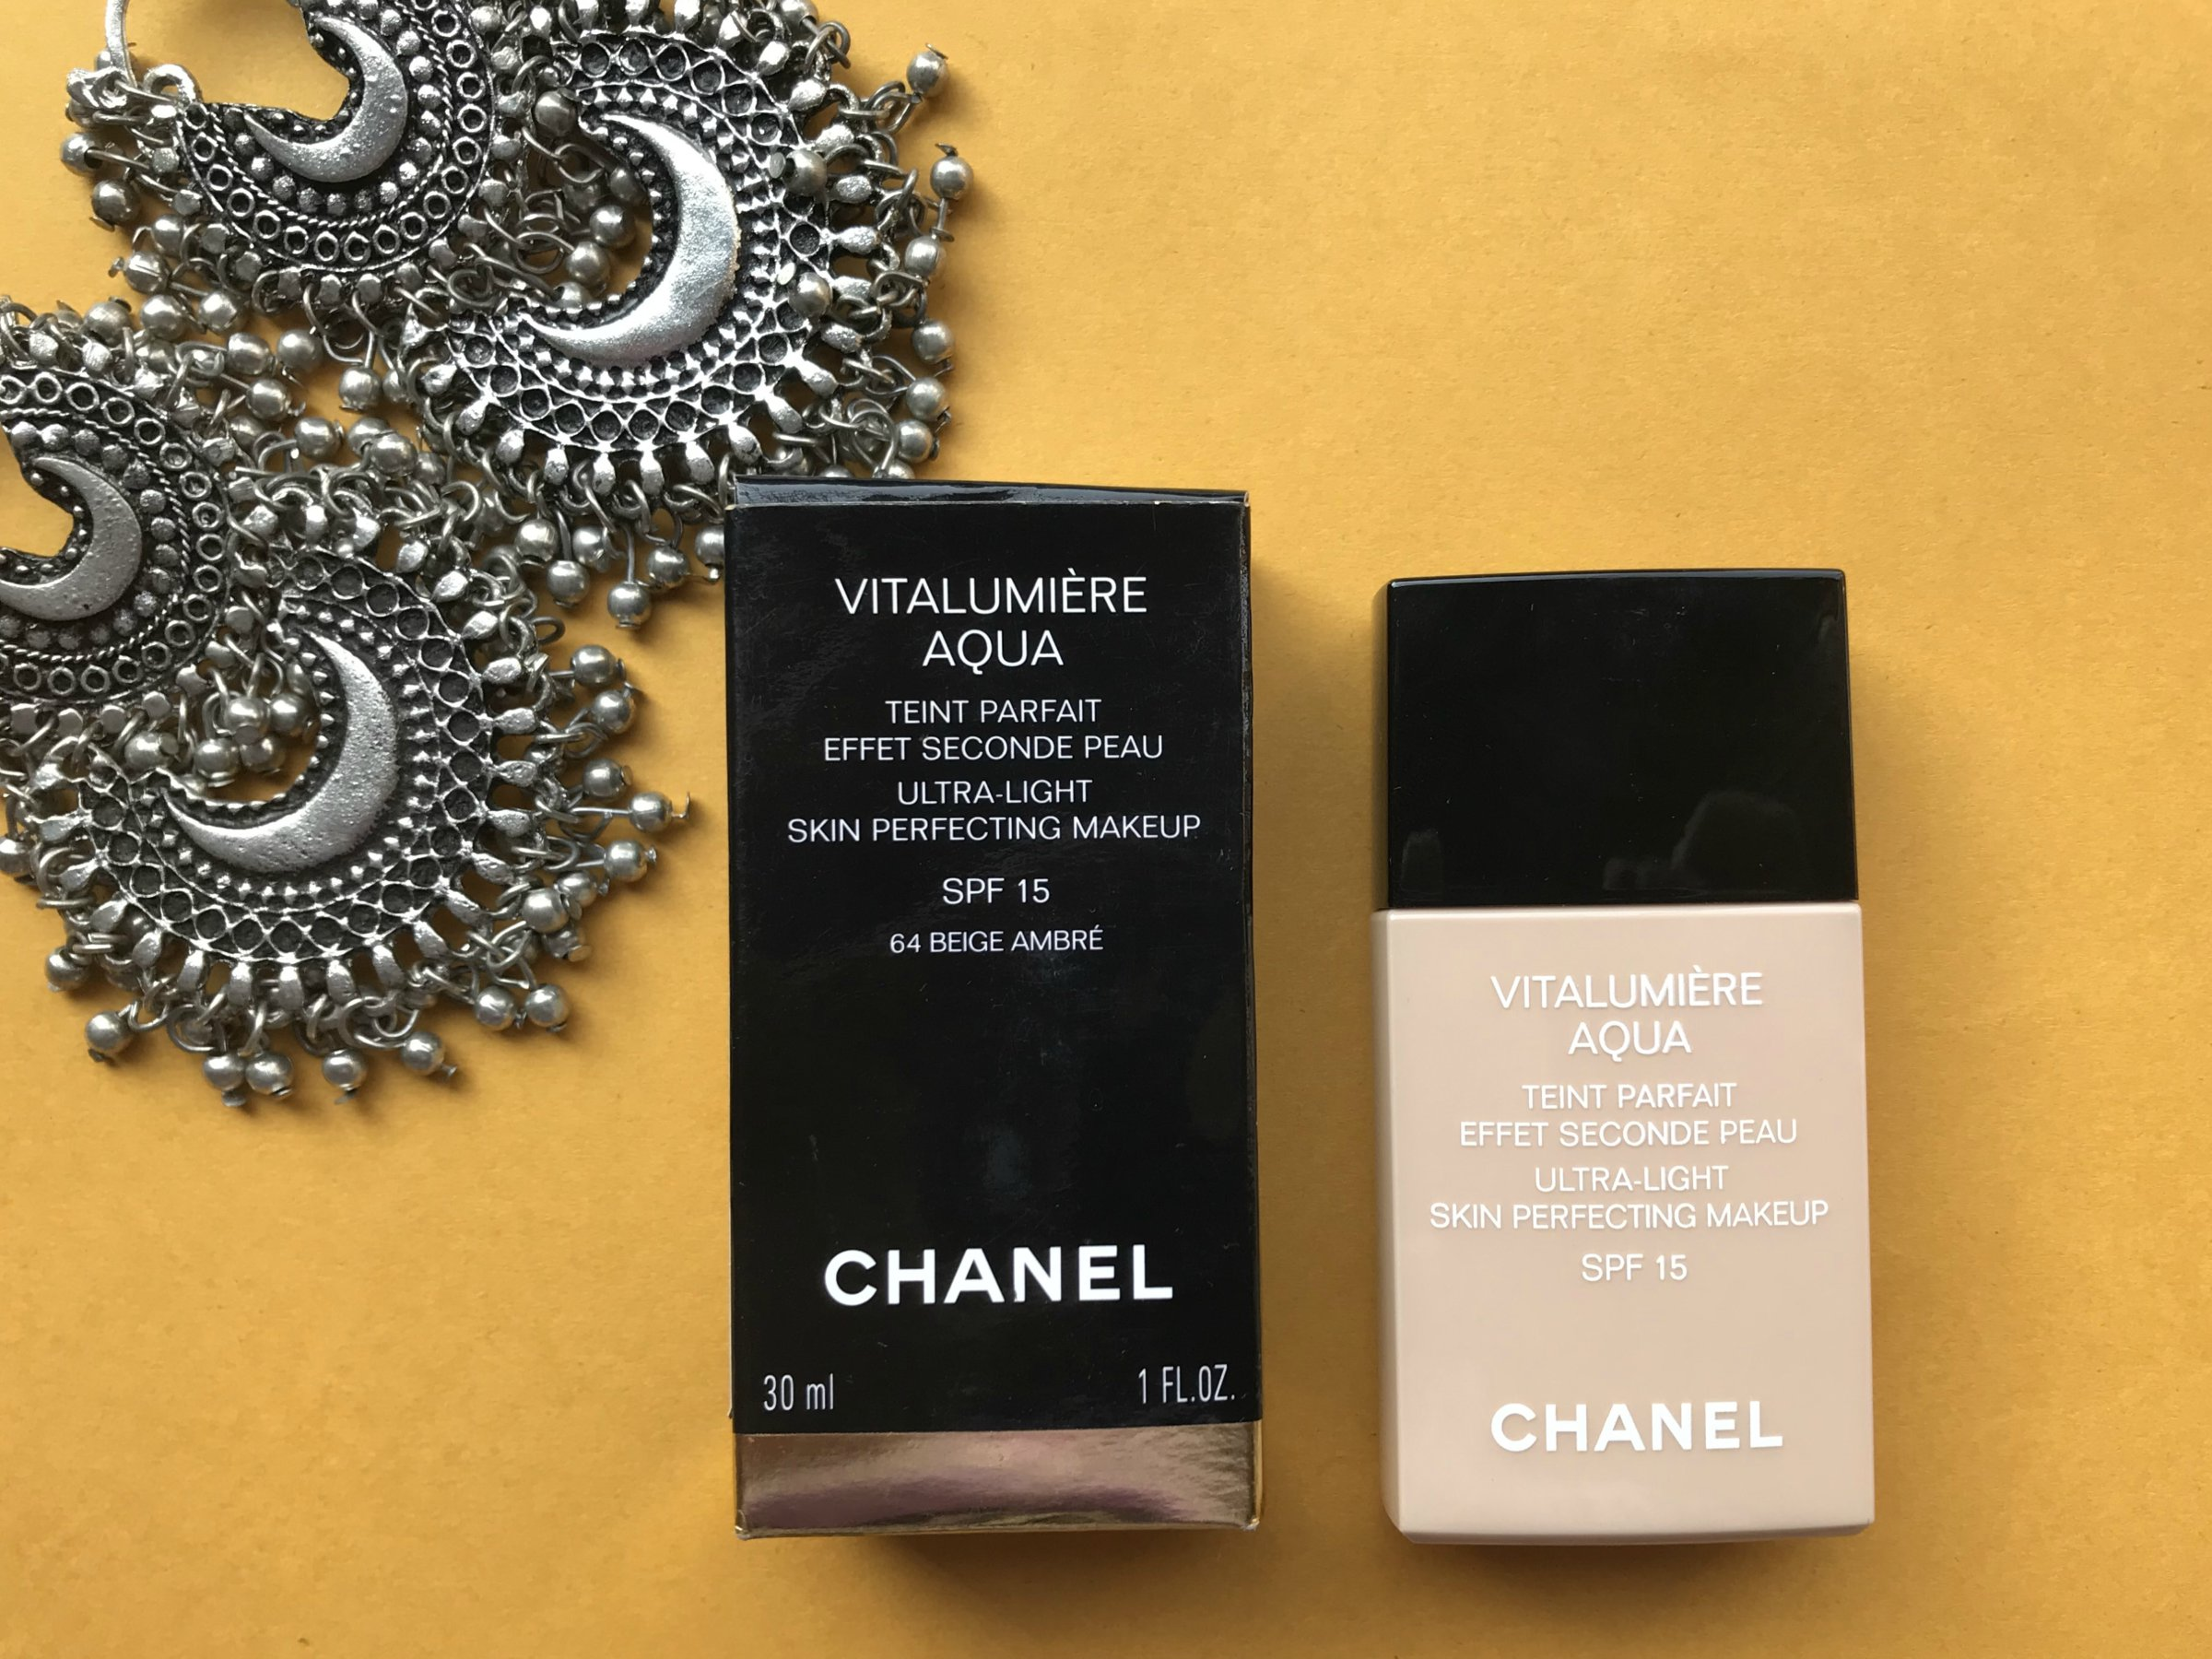 Chanel Vitalumi 232 Re Aqua Ultra Light Skin Perfecting Makeup